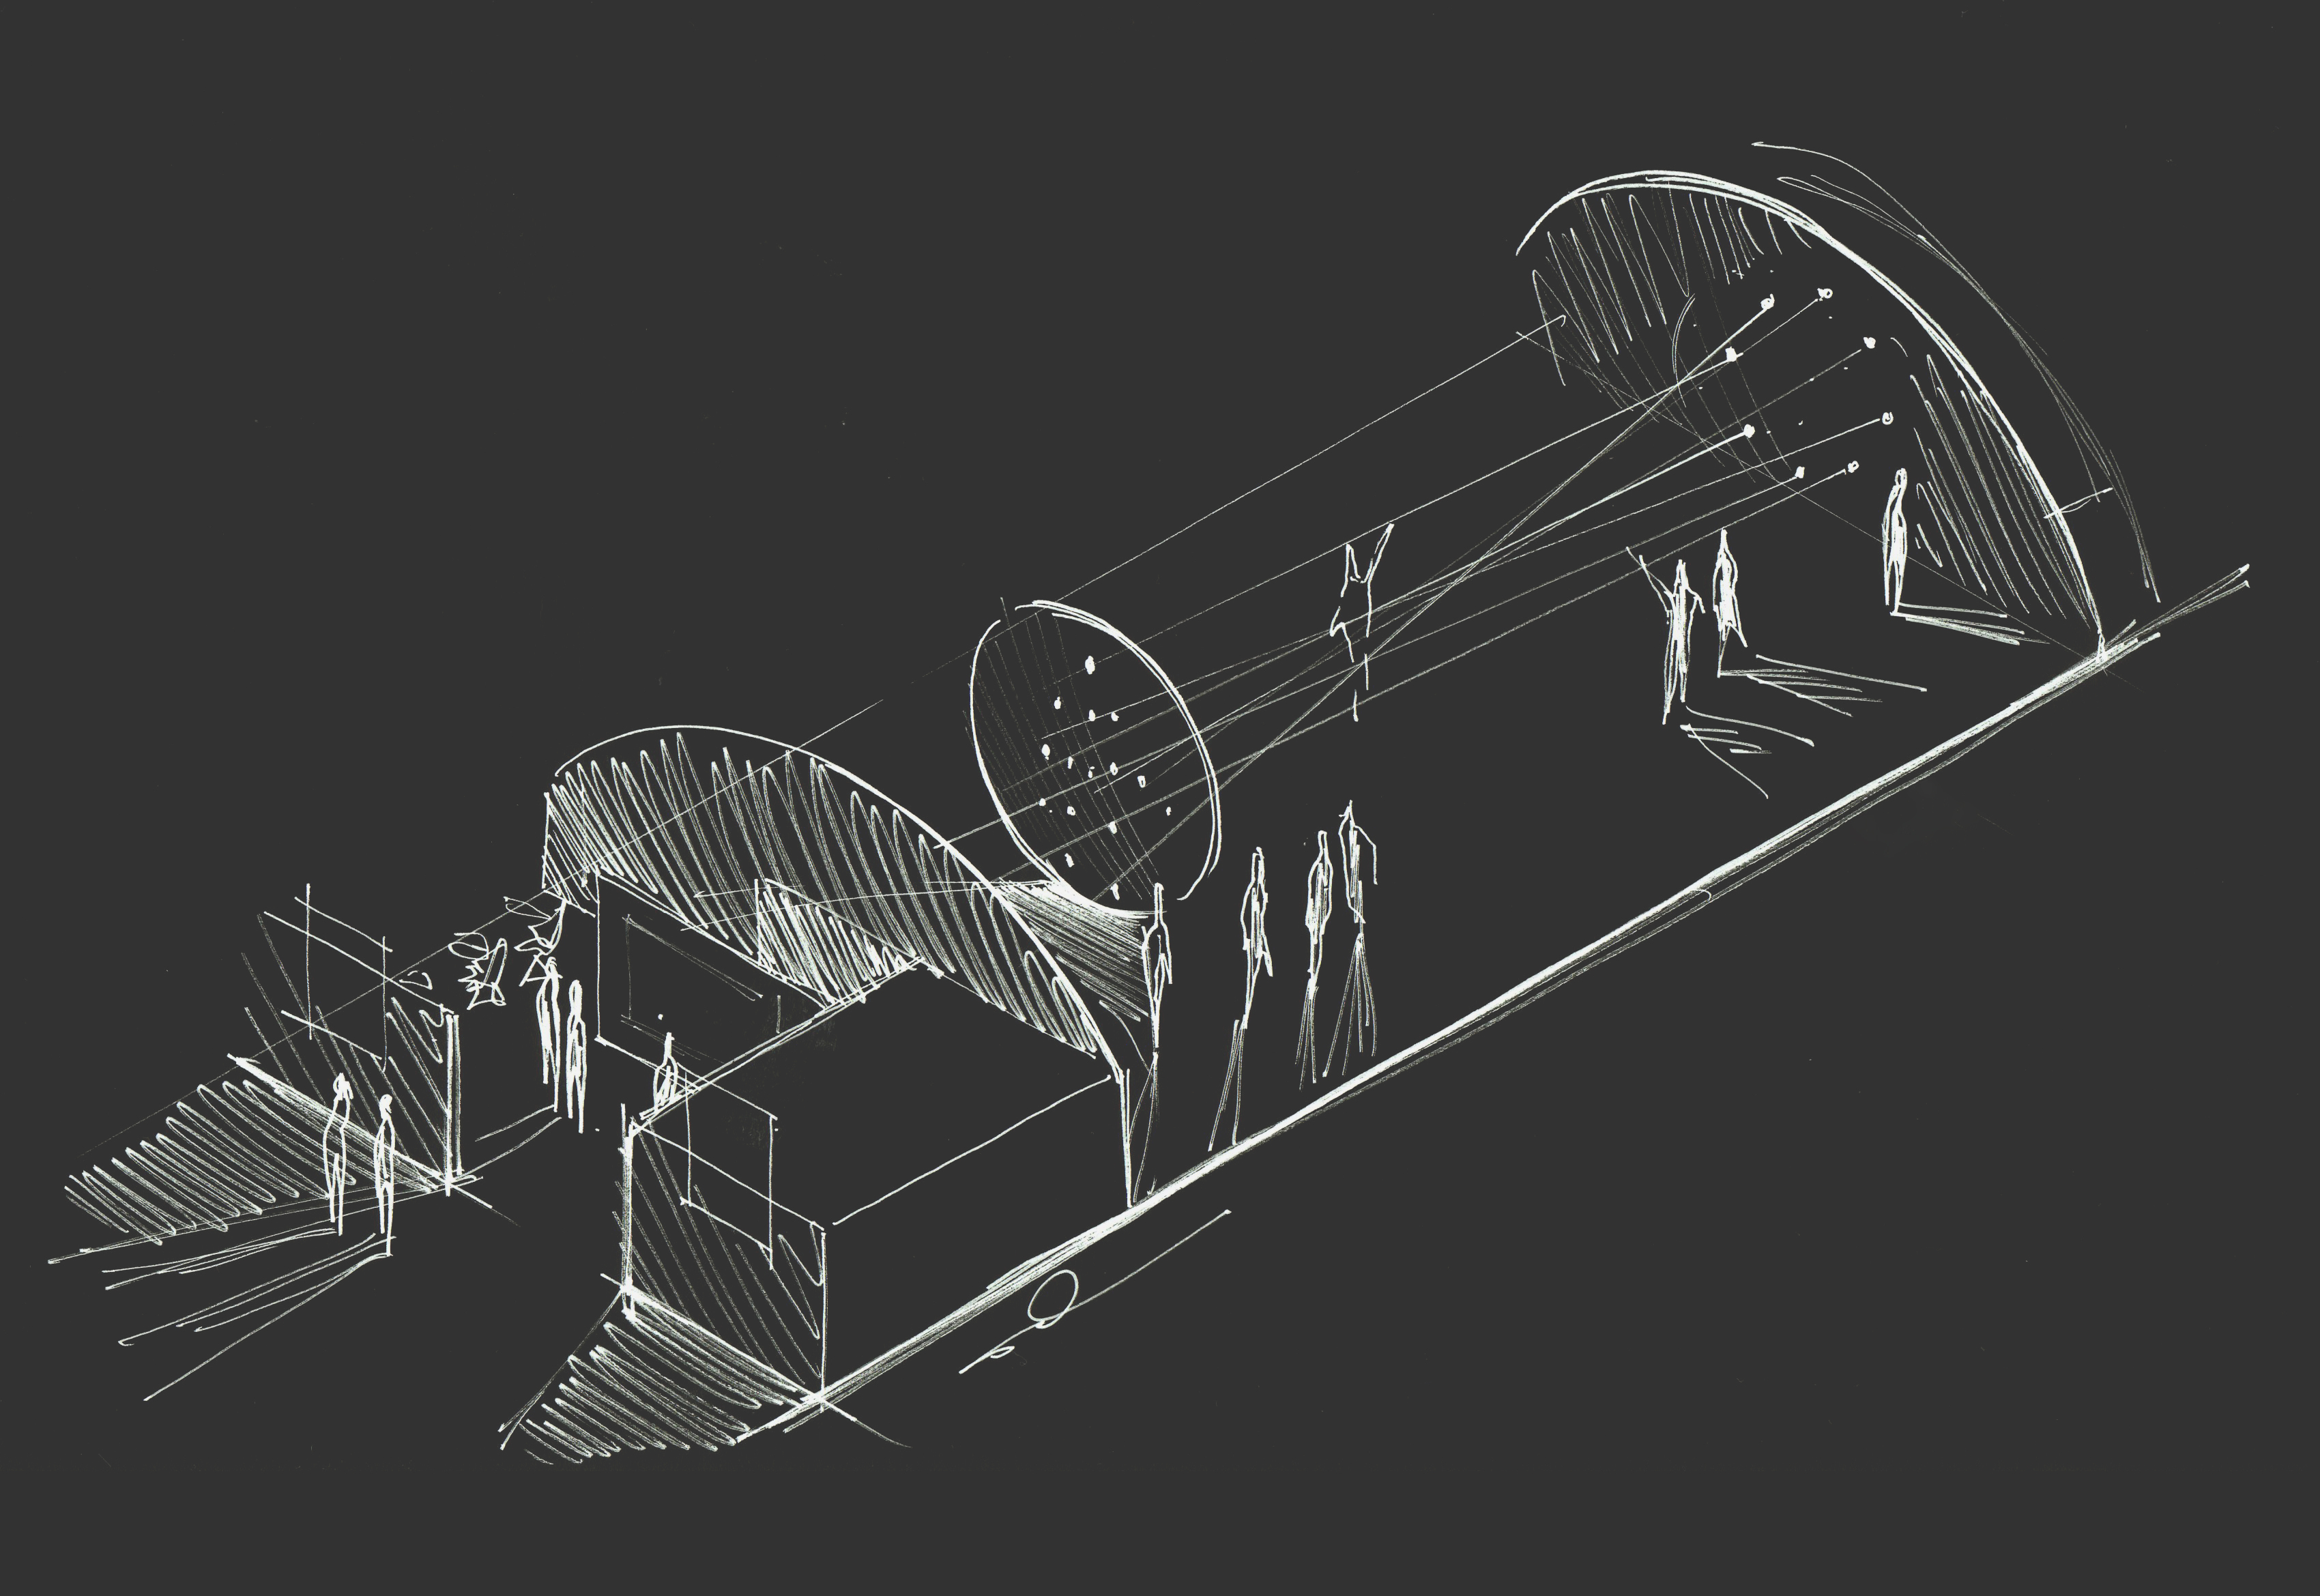 Original hand sketch of concept by Todd Bracher.jpg